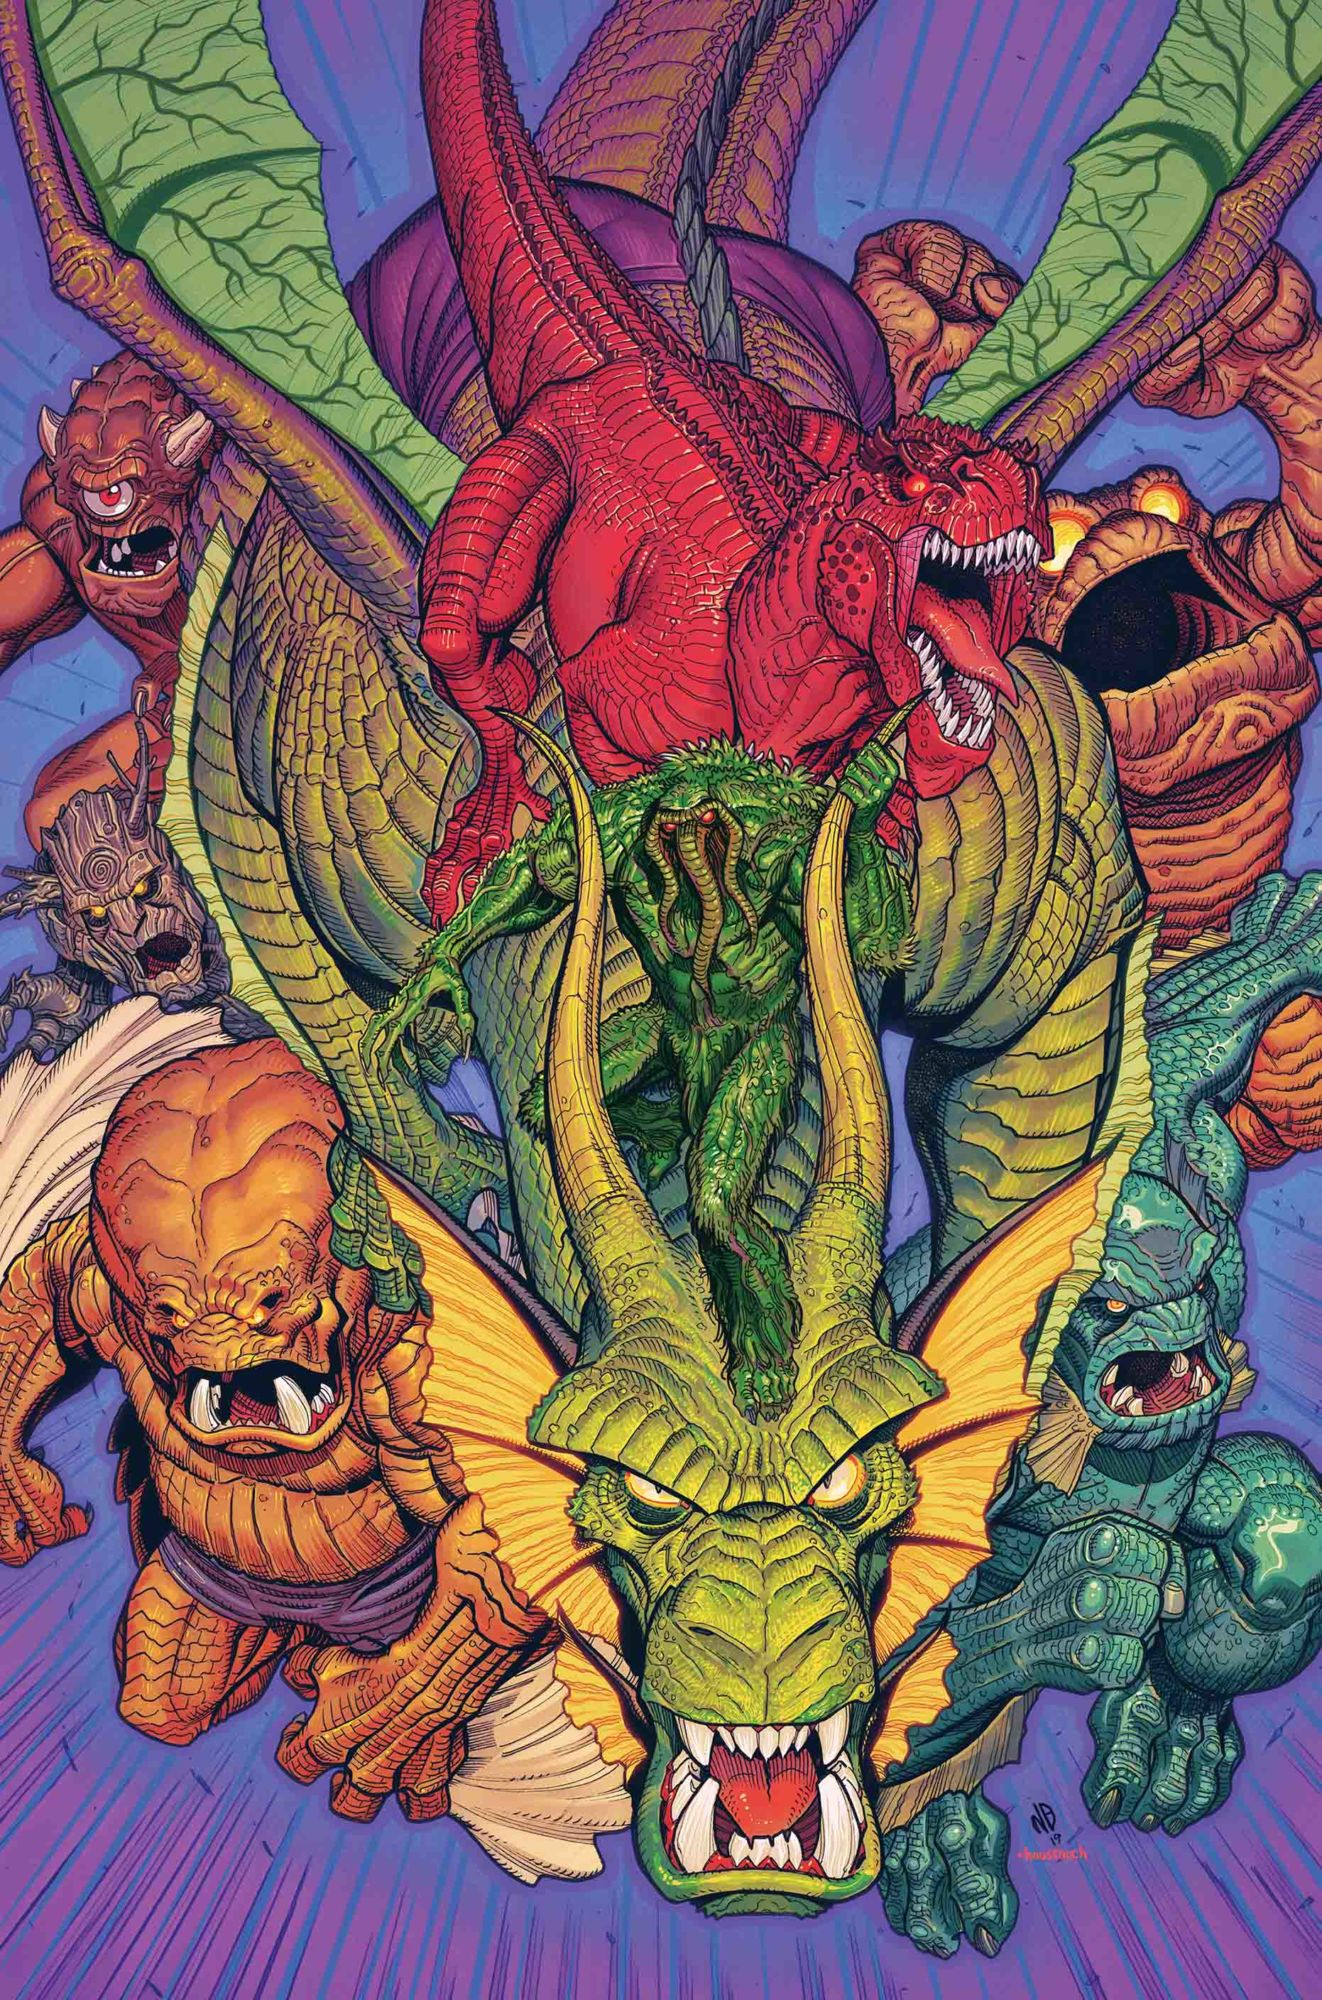 Cullen Bunn Returns to Marvel Monsters – For Trademark Reasons?